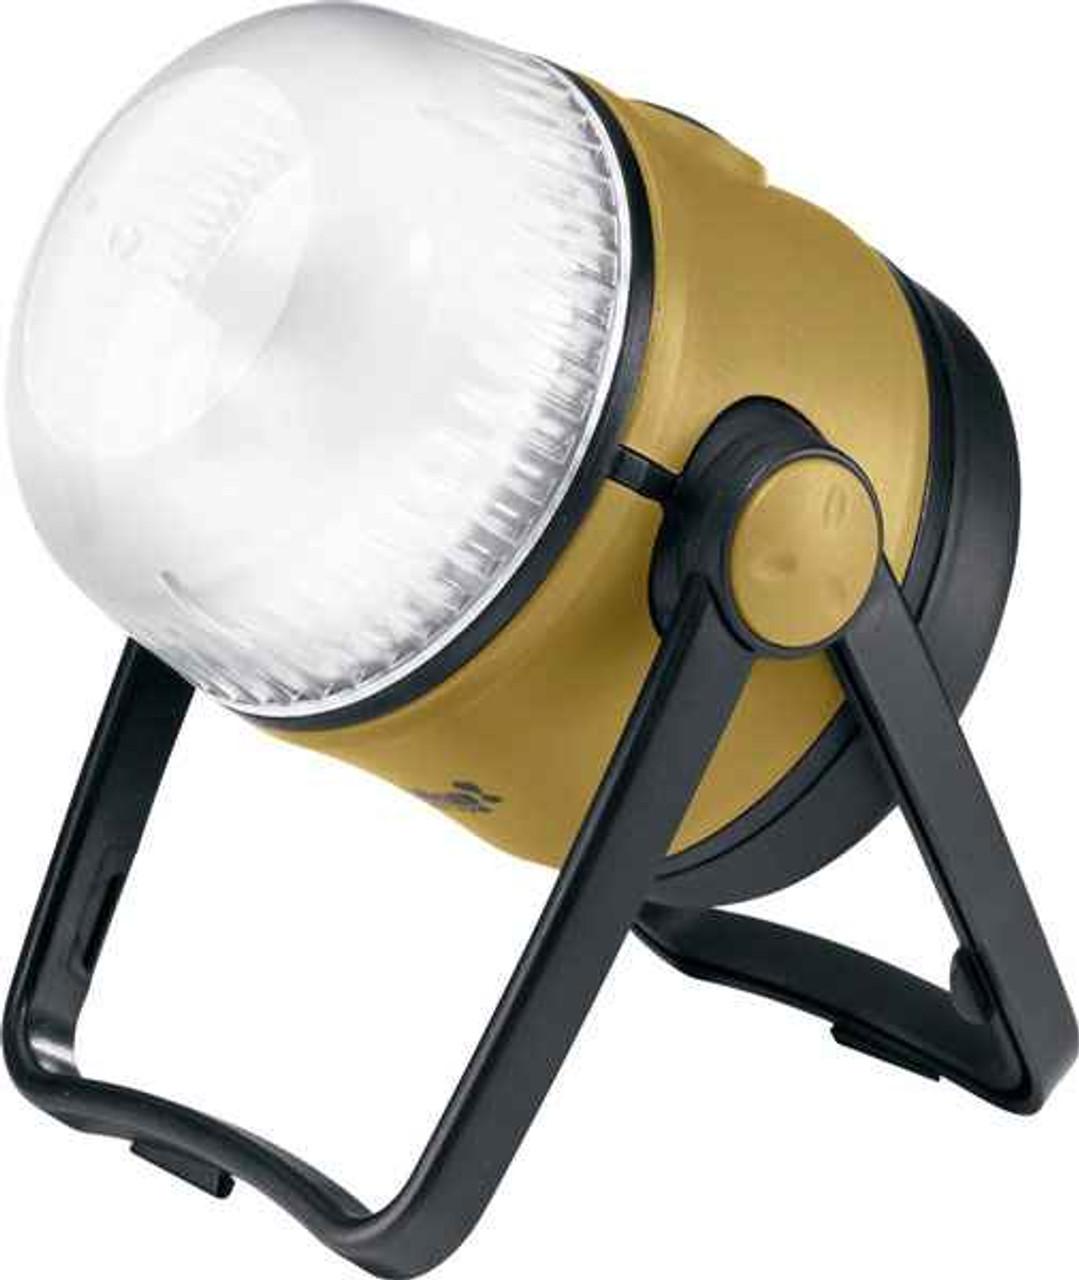 Eureka Spotlight 176 LED Lantern, 176 Max Lumens